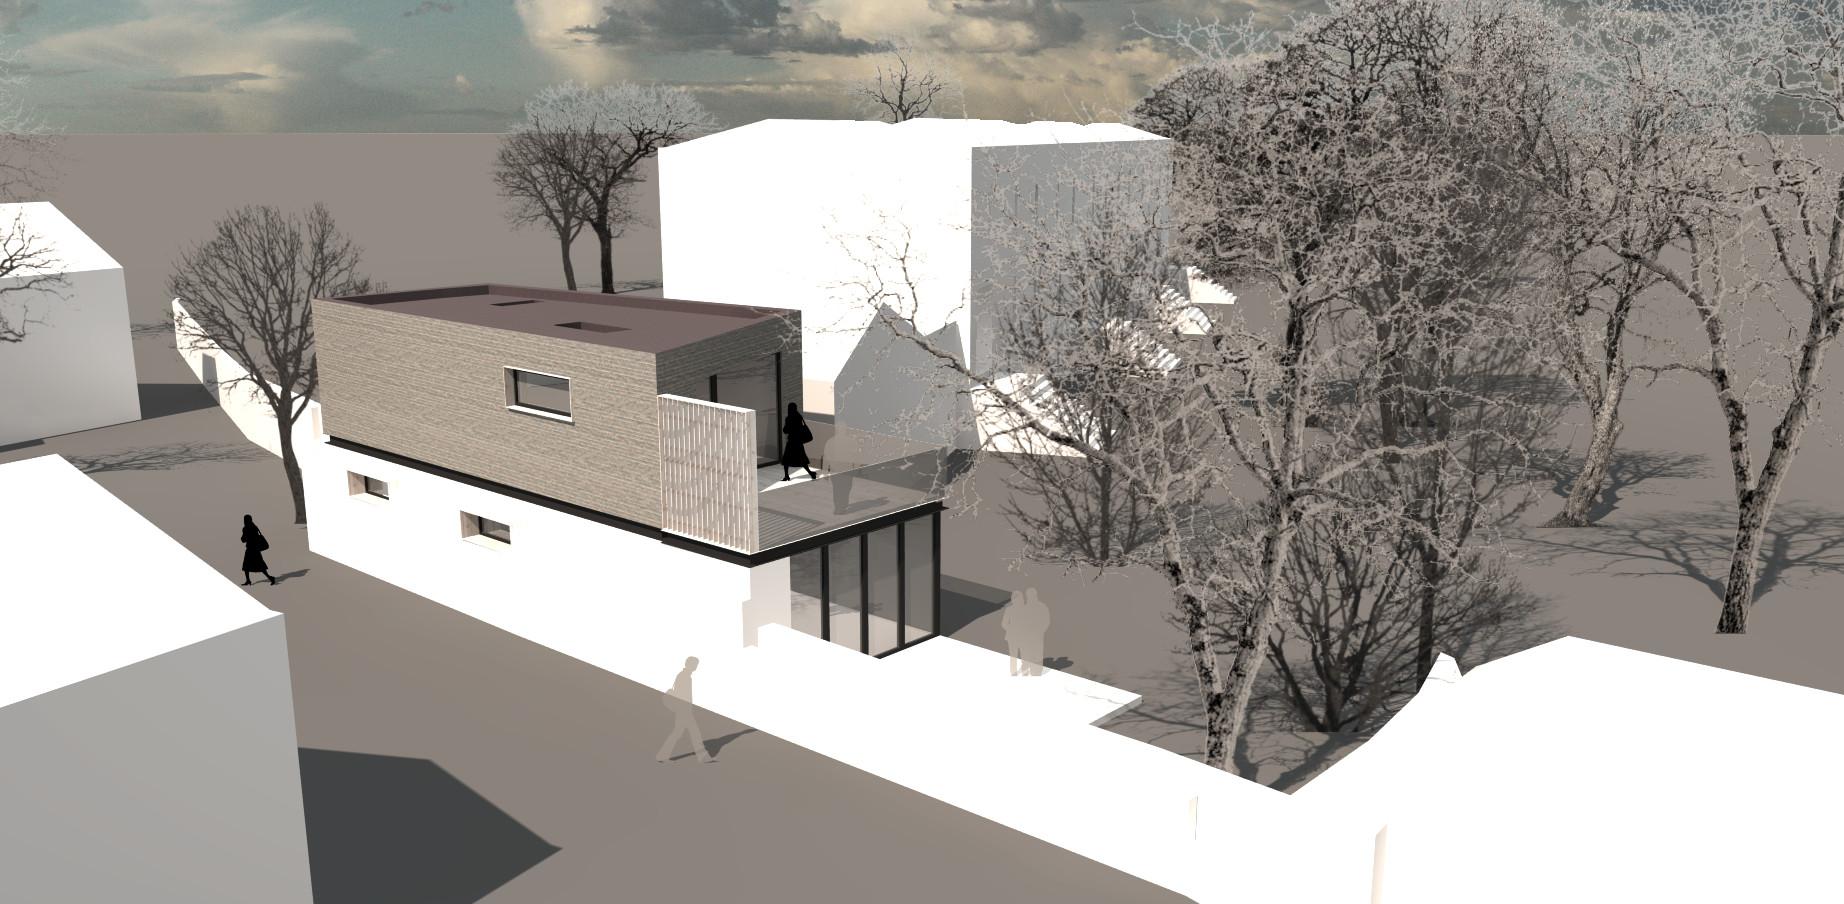 House Extention_Refurb_Clontarf Road  view 3.jpg